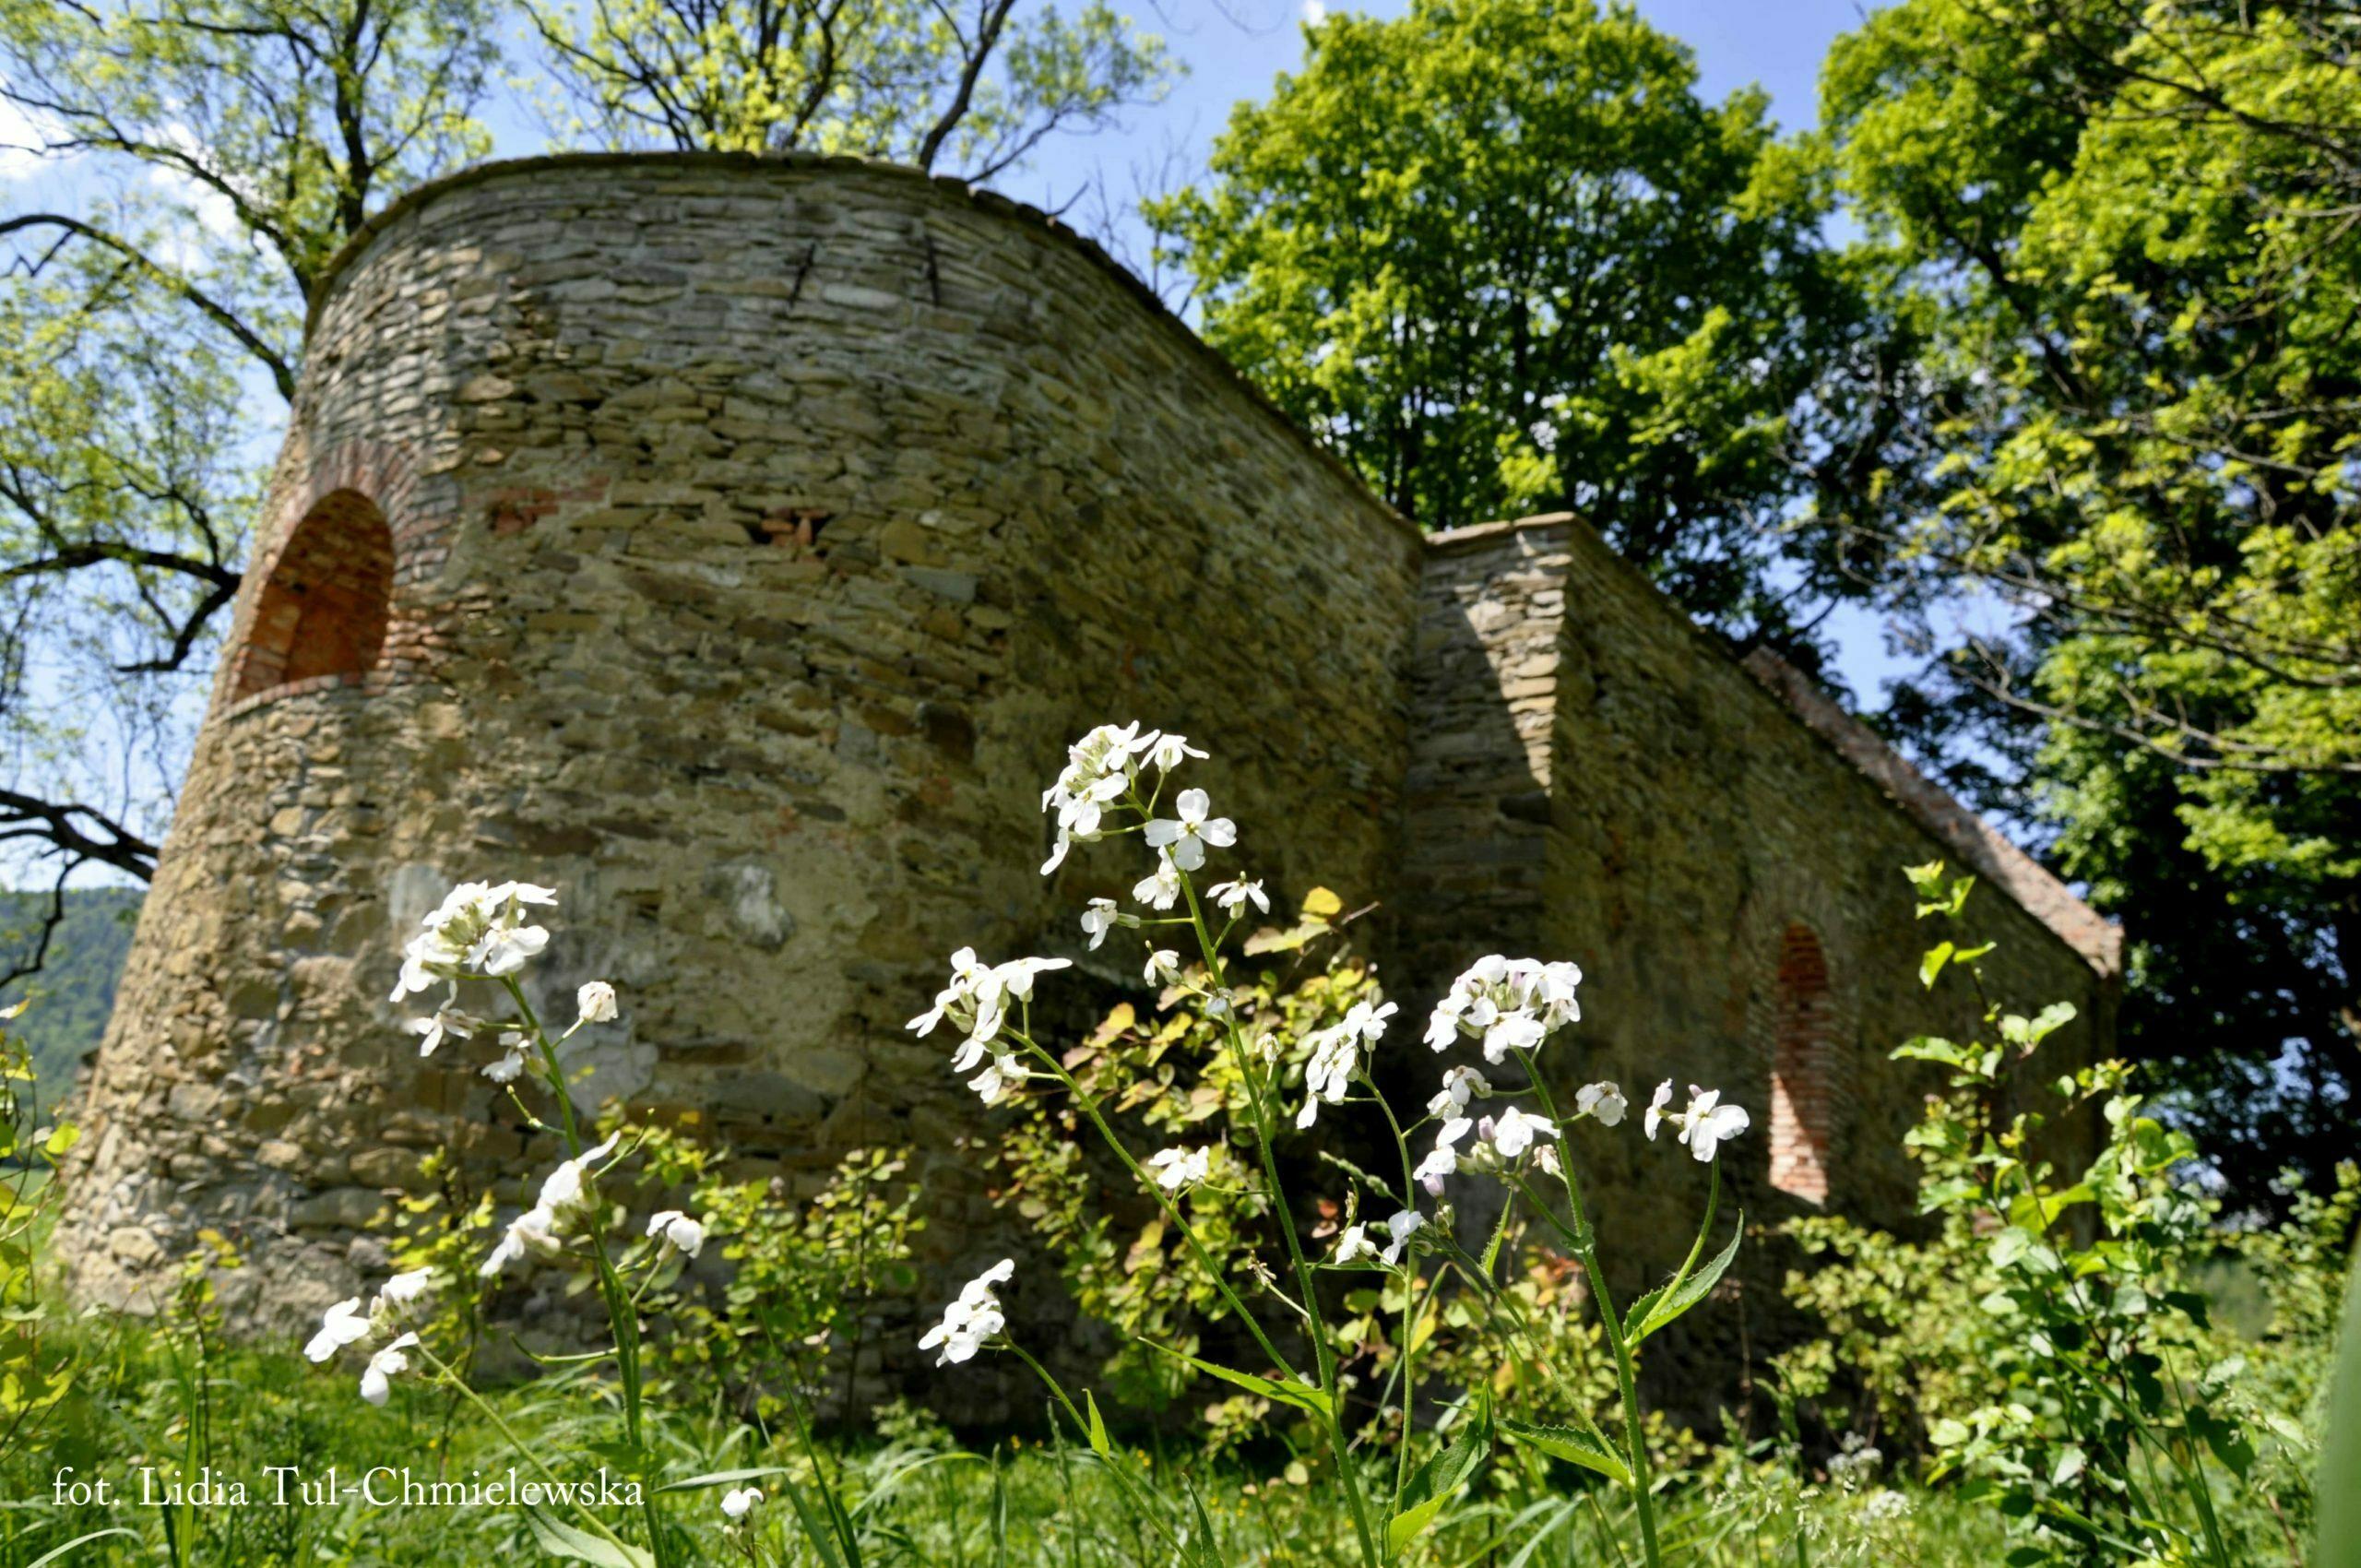 Ruiny cerkwi w Krywe / fot. Lidia Tul-Chmielewska